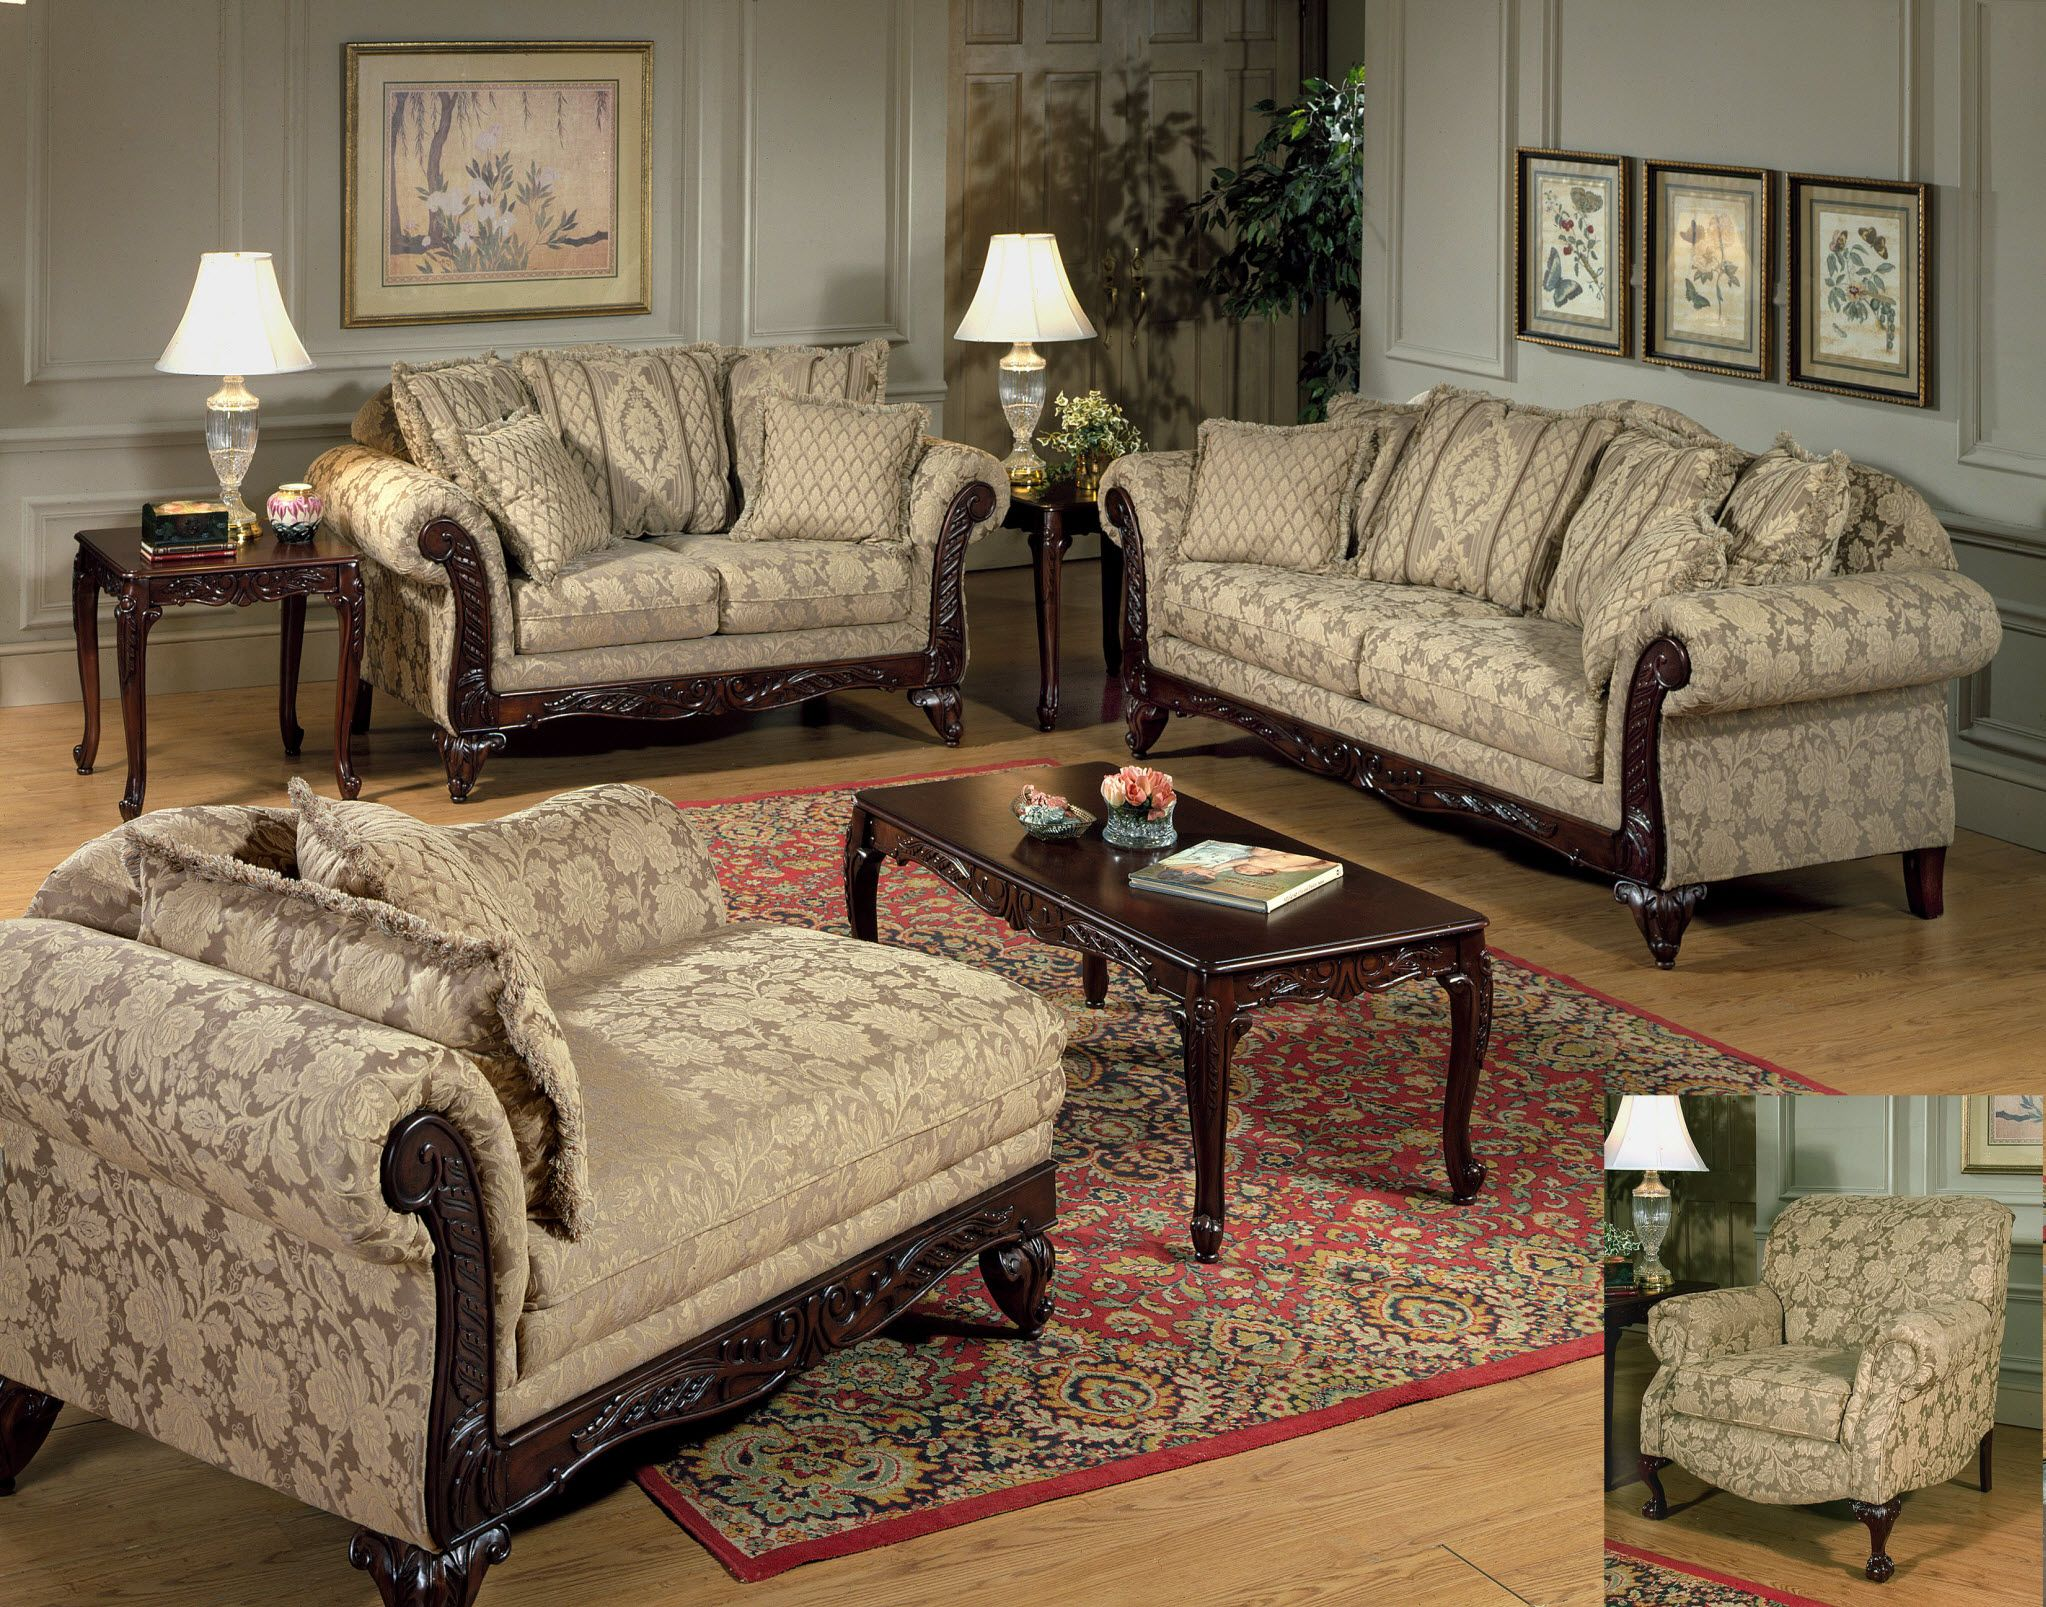 Sofa And Love Seat 899 00 Shown In Clarissa Carmel Sofa 499 00